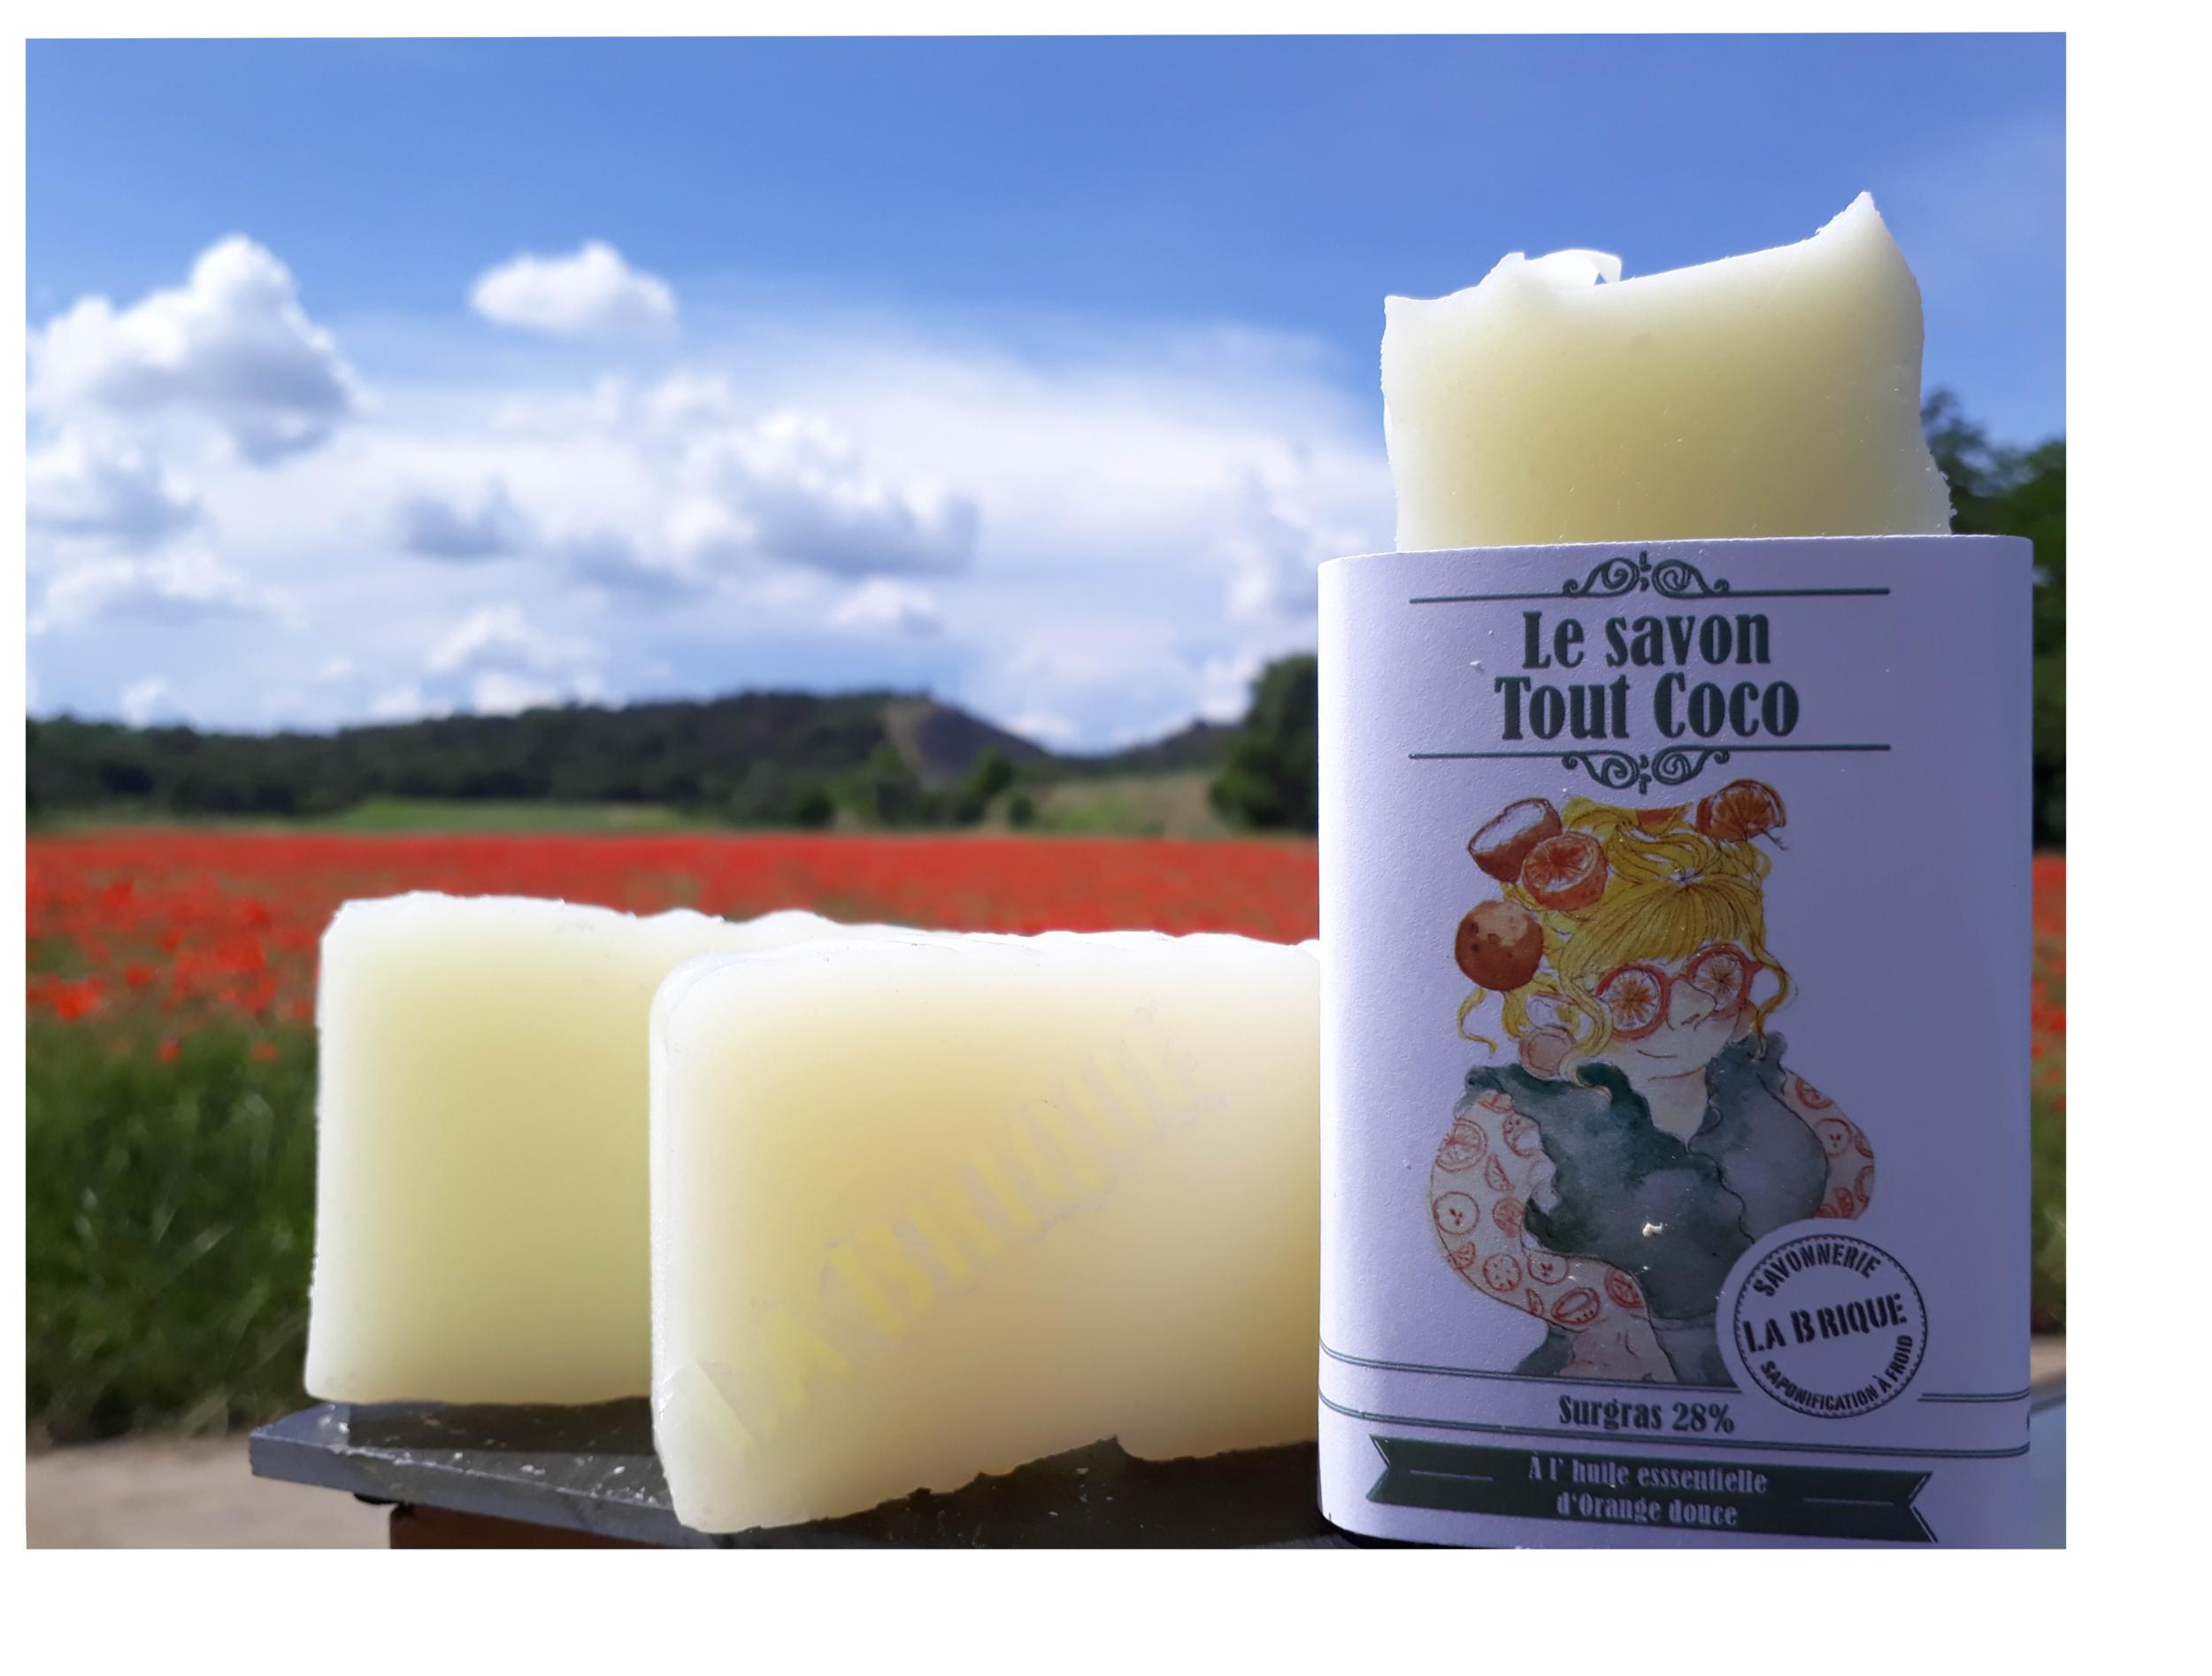 Le savon Tout Coco - 100g